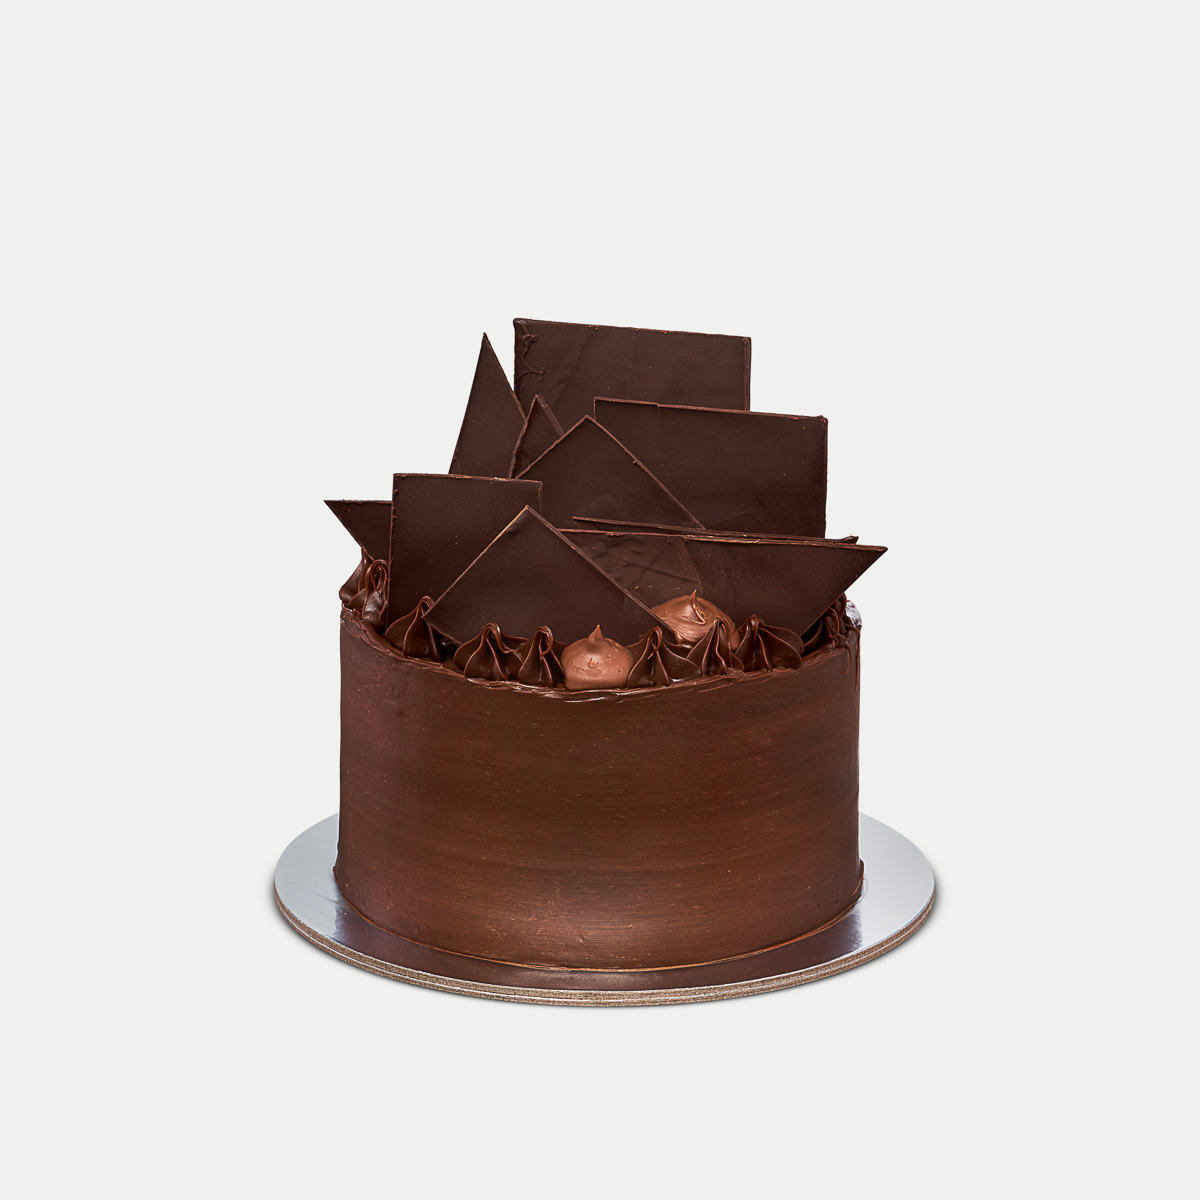 DARK CHOCOLATE 1 KG